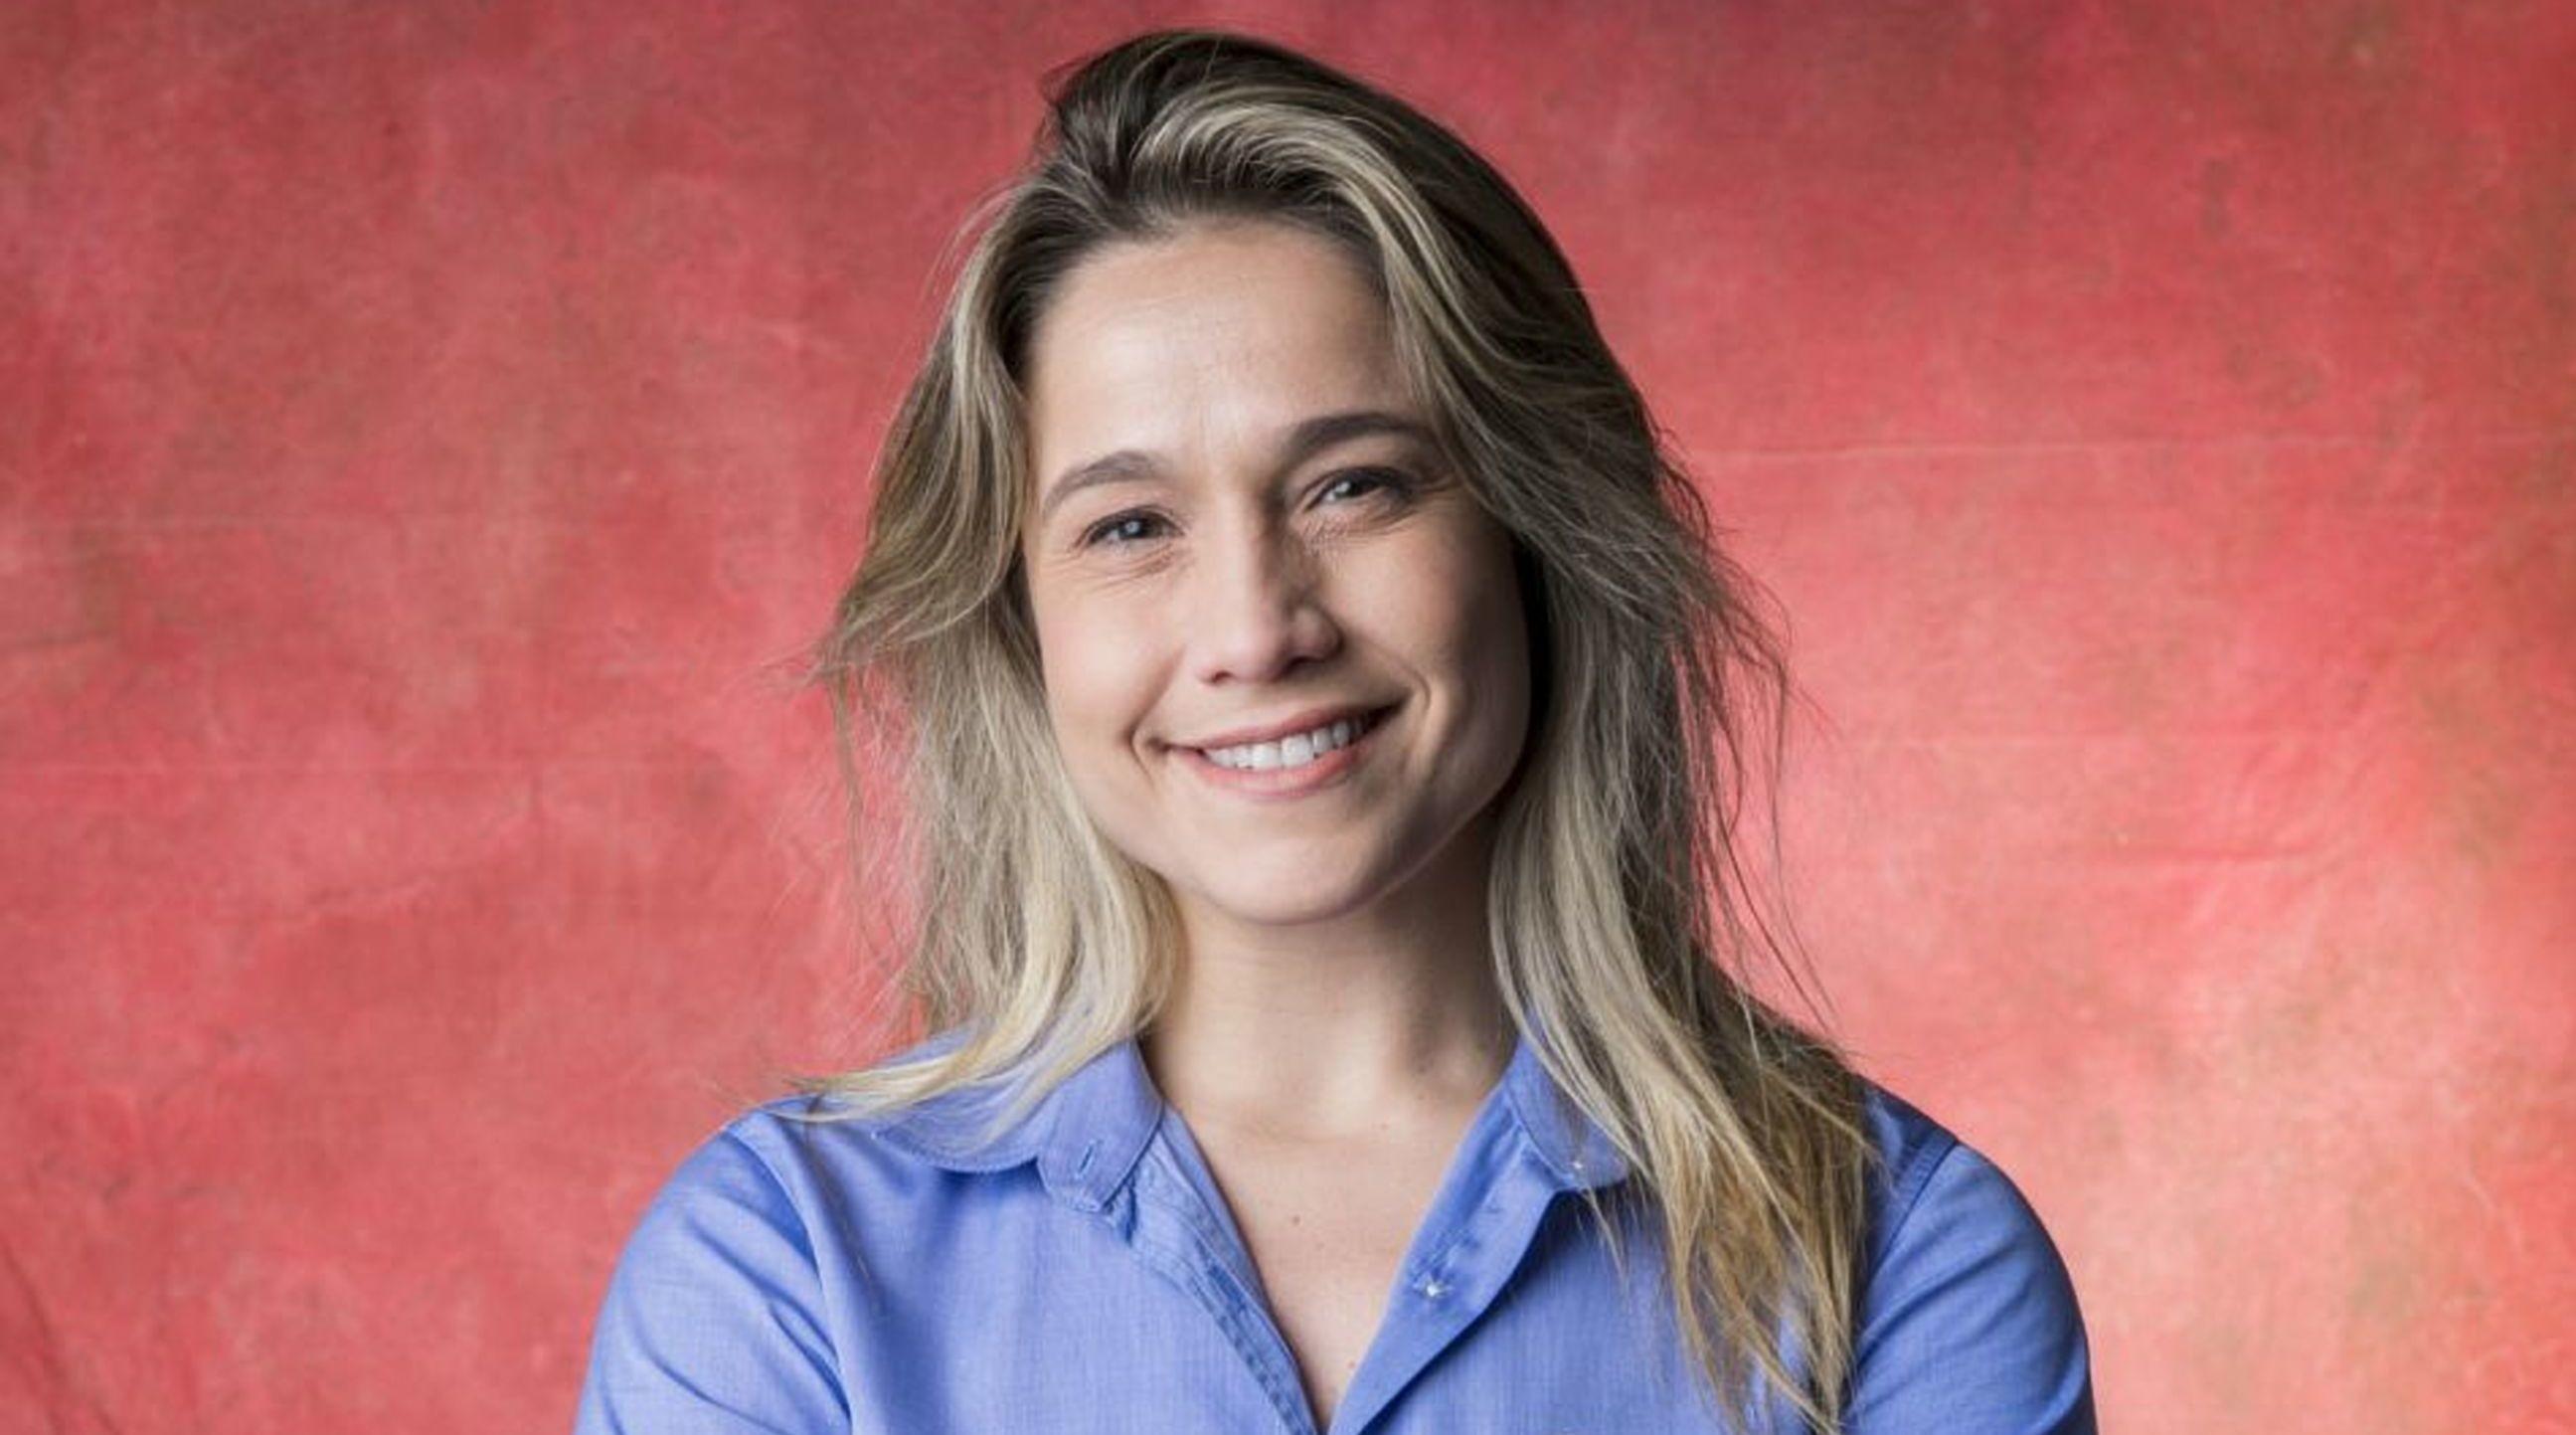 Fernanda Gentil e Porchat devem apresentar substituto do 'Vídeo Show'